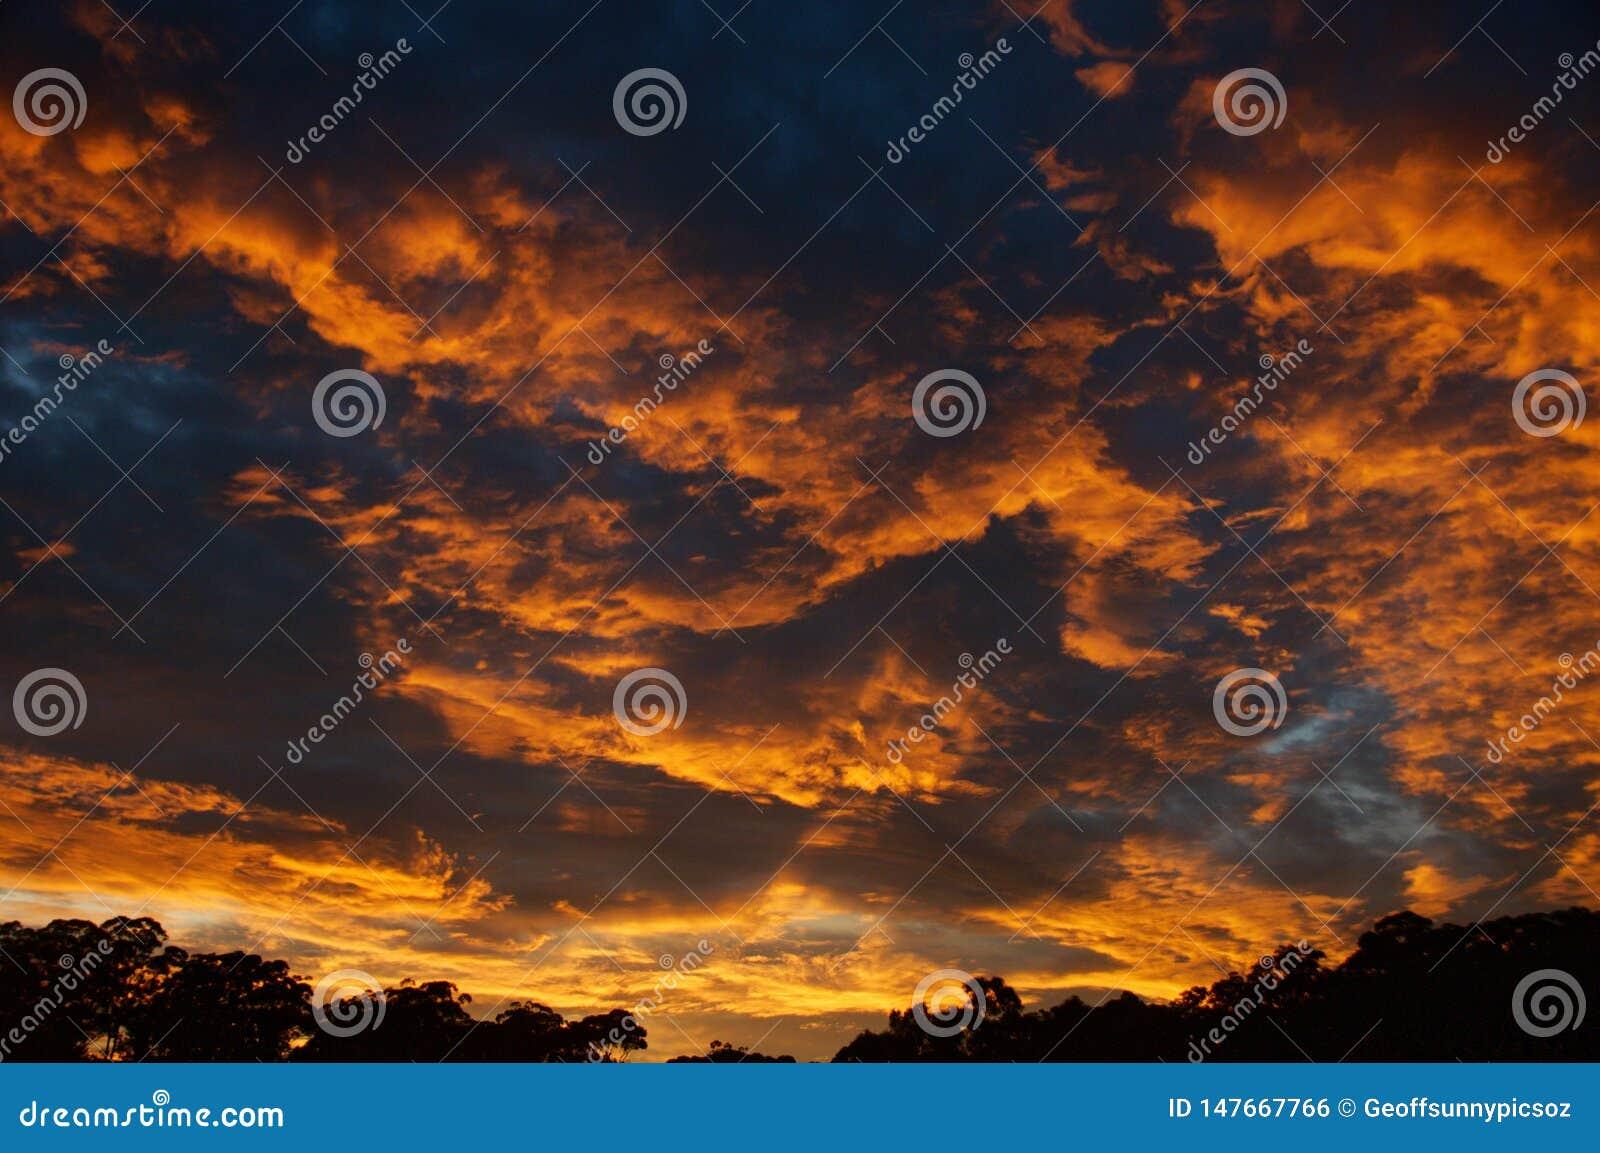 Dramatic orange coloured stratocumulus sunrise cloudscape